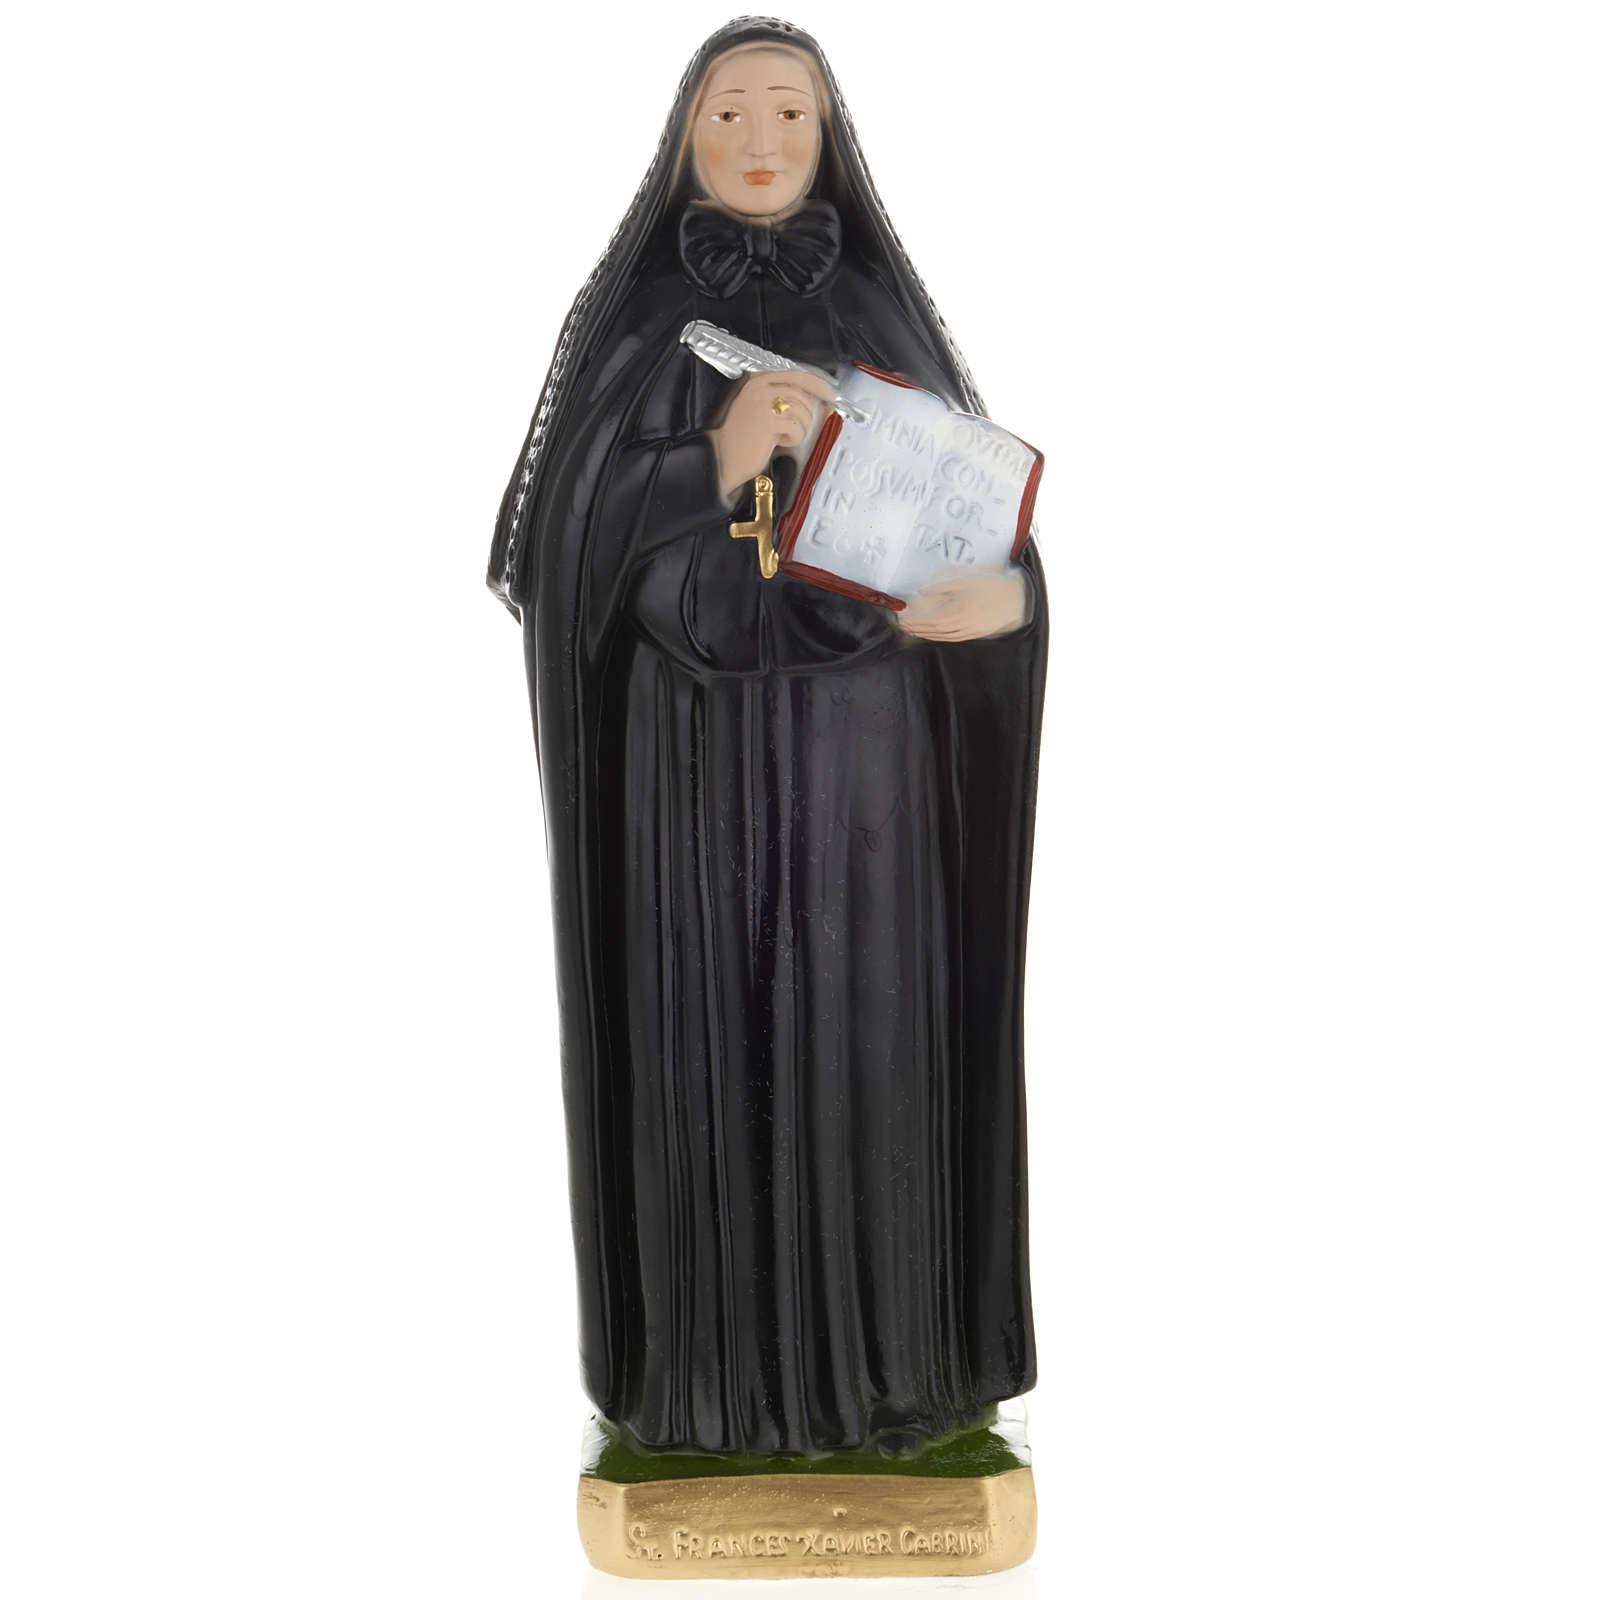 Figurka Święta Franciszka Cabrini 30cm gips 4